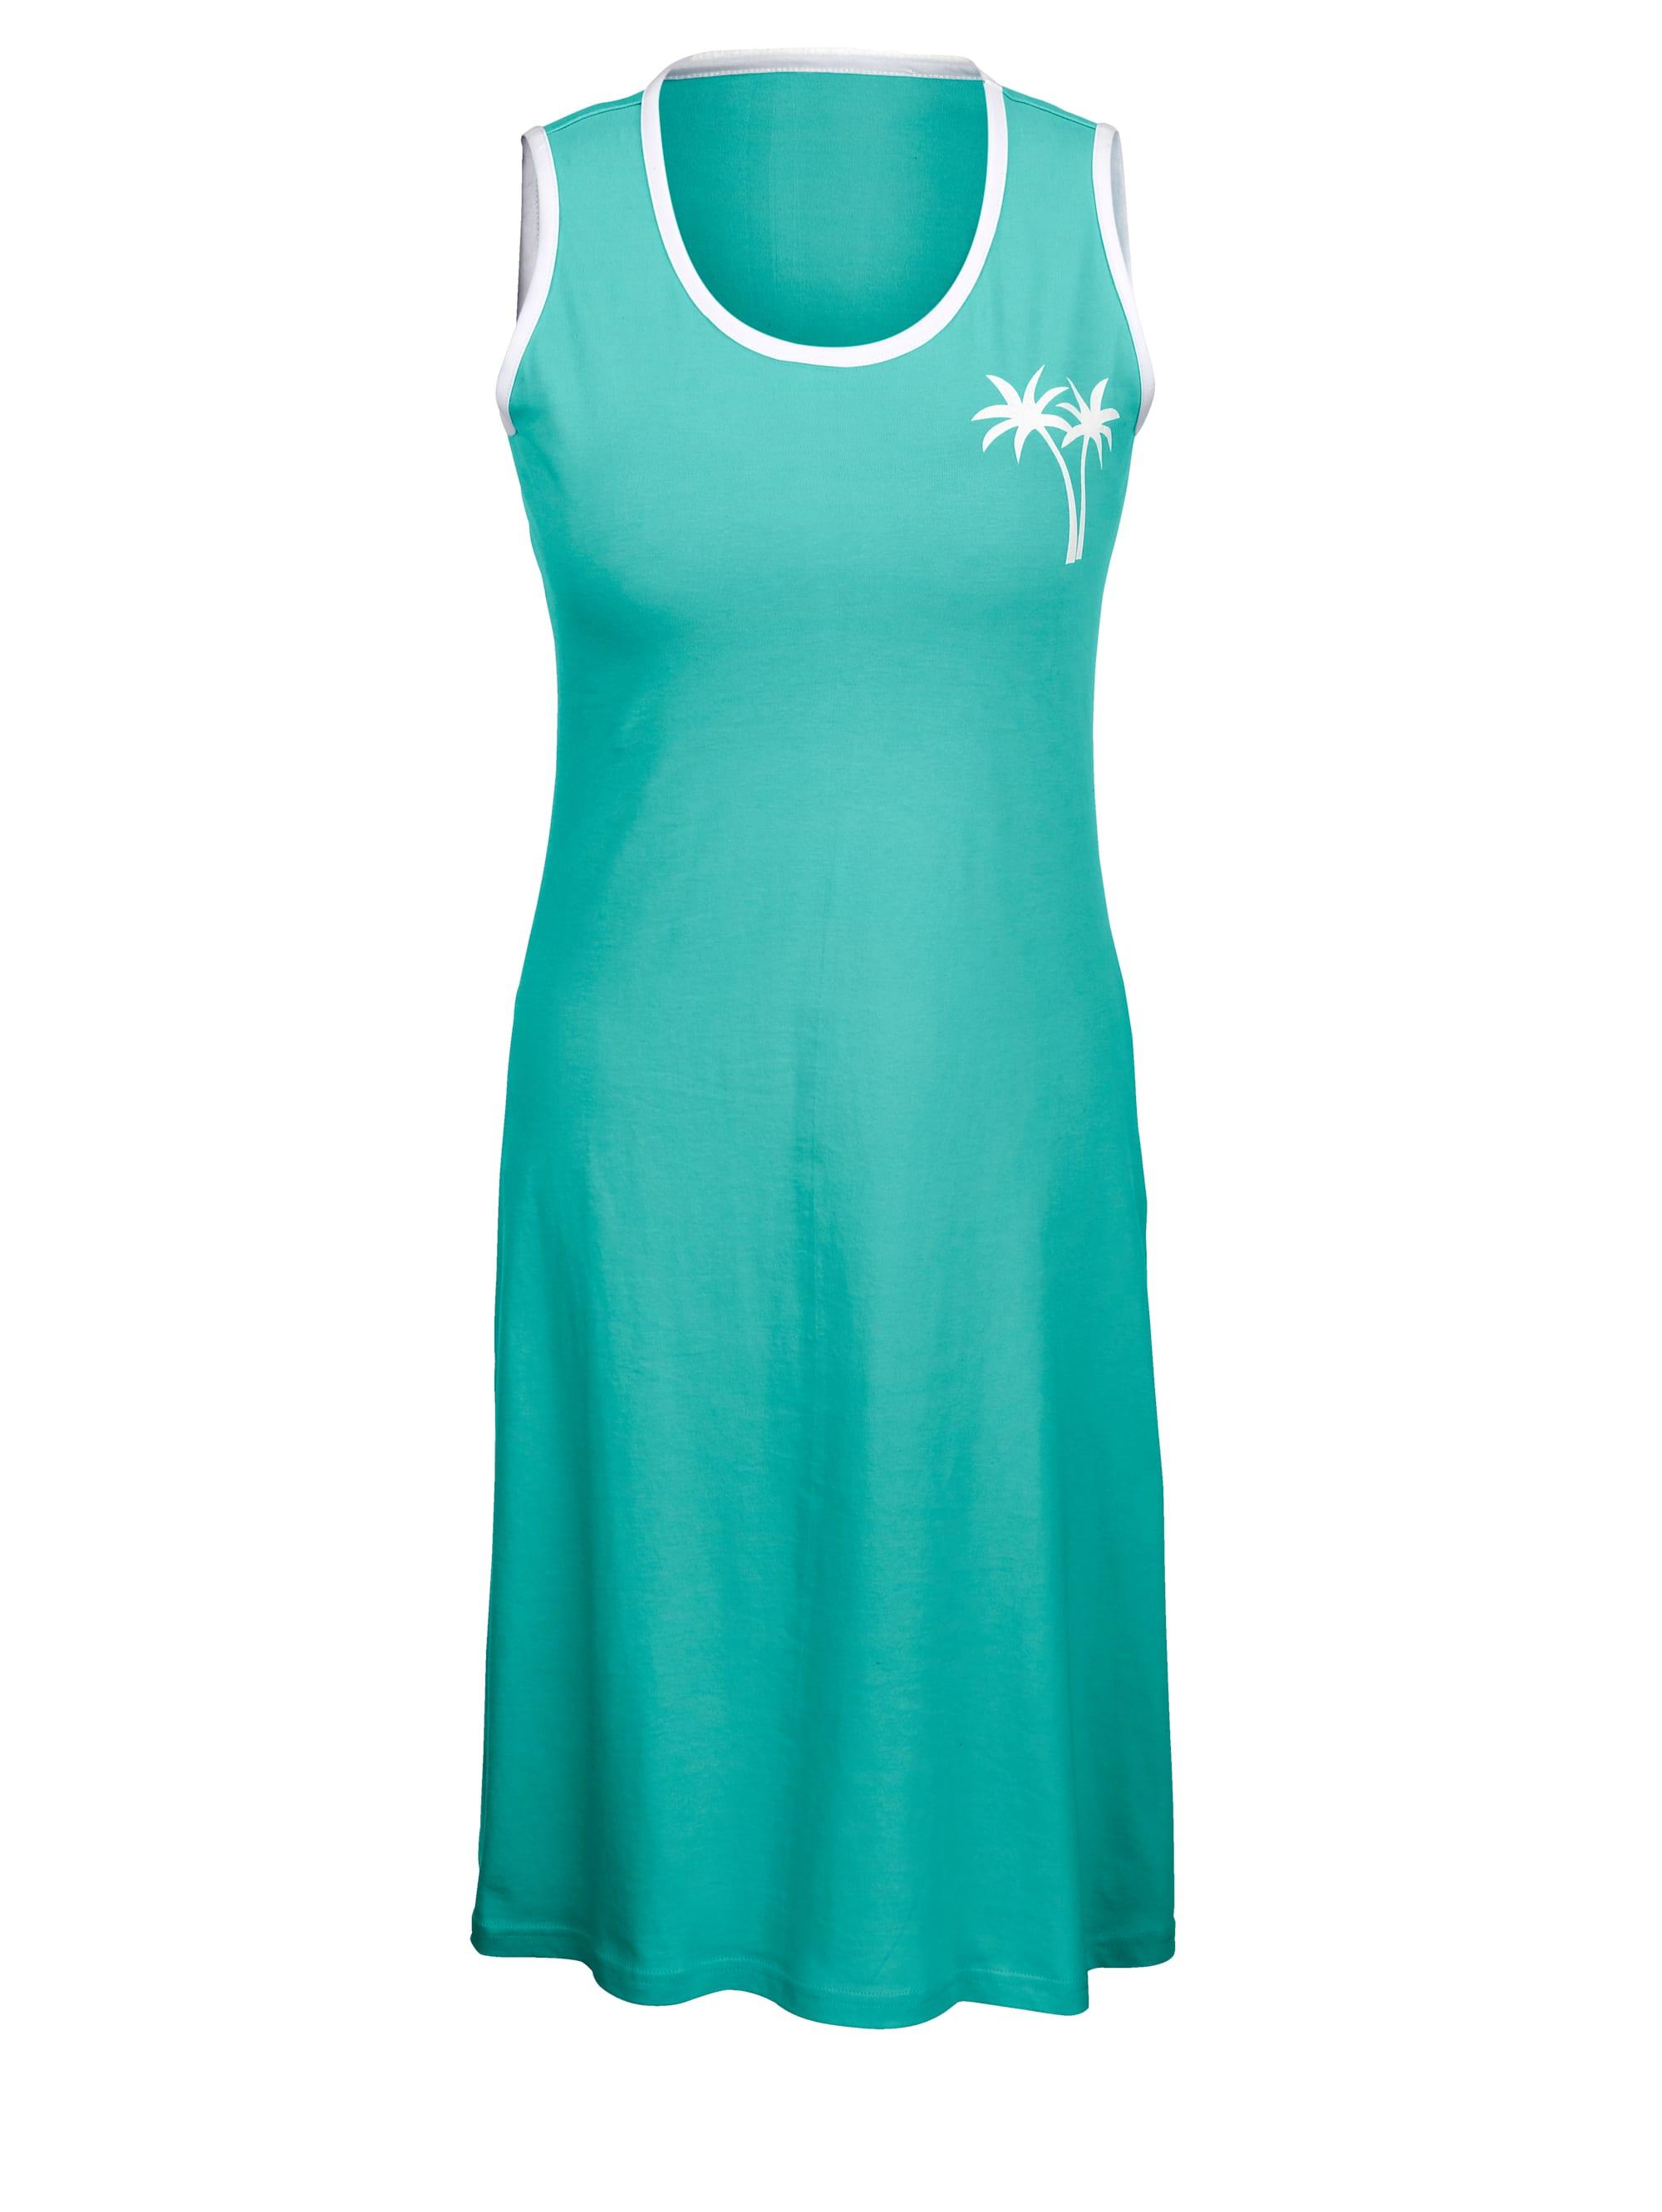 Maritim Strandkleid mit dekorativer Kontrastpaspelierung 4bBms KpUDM